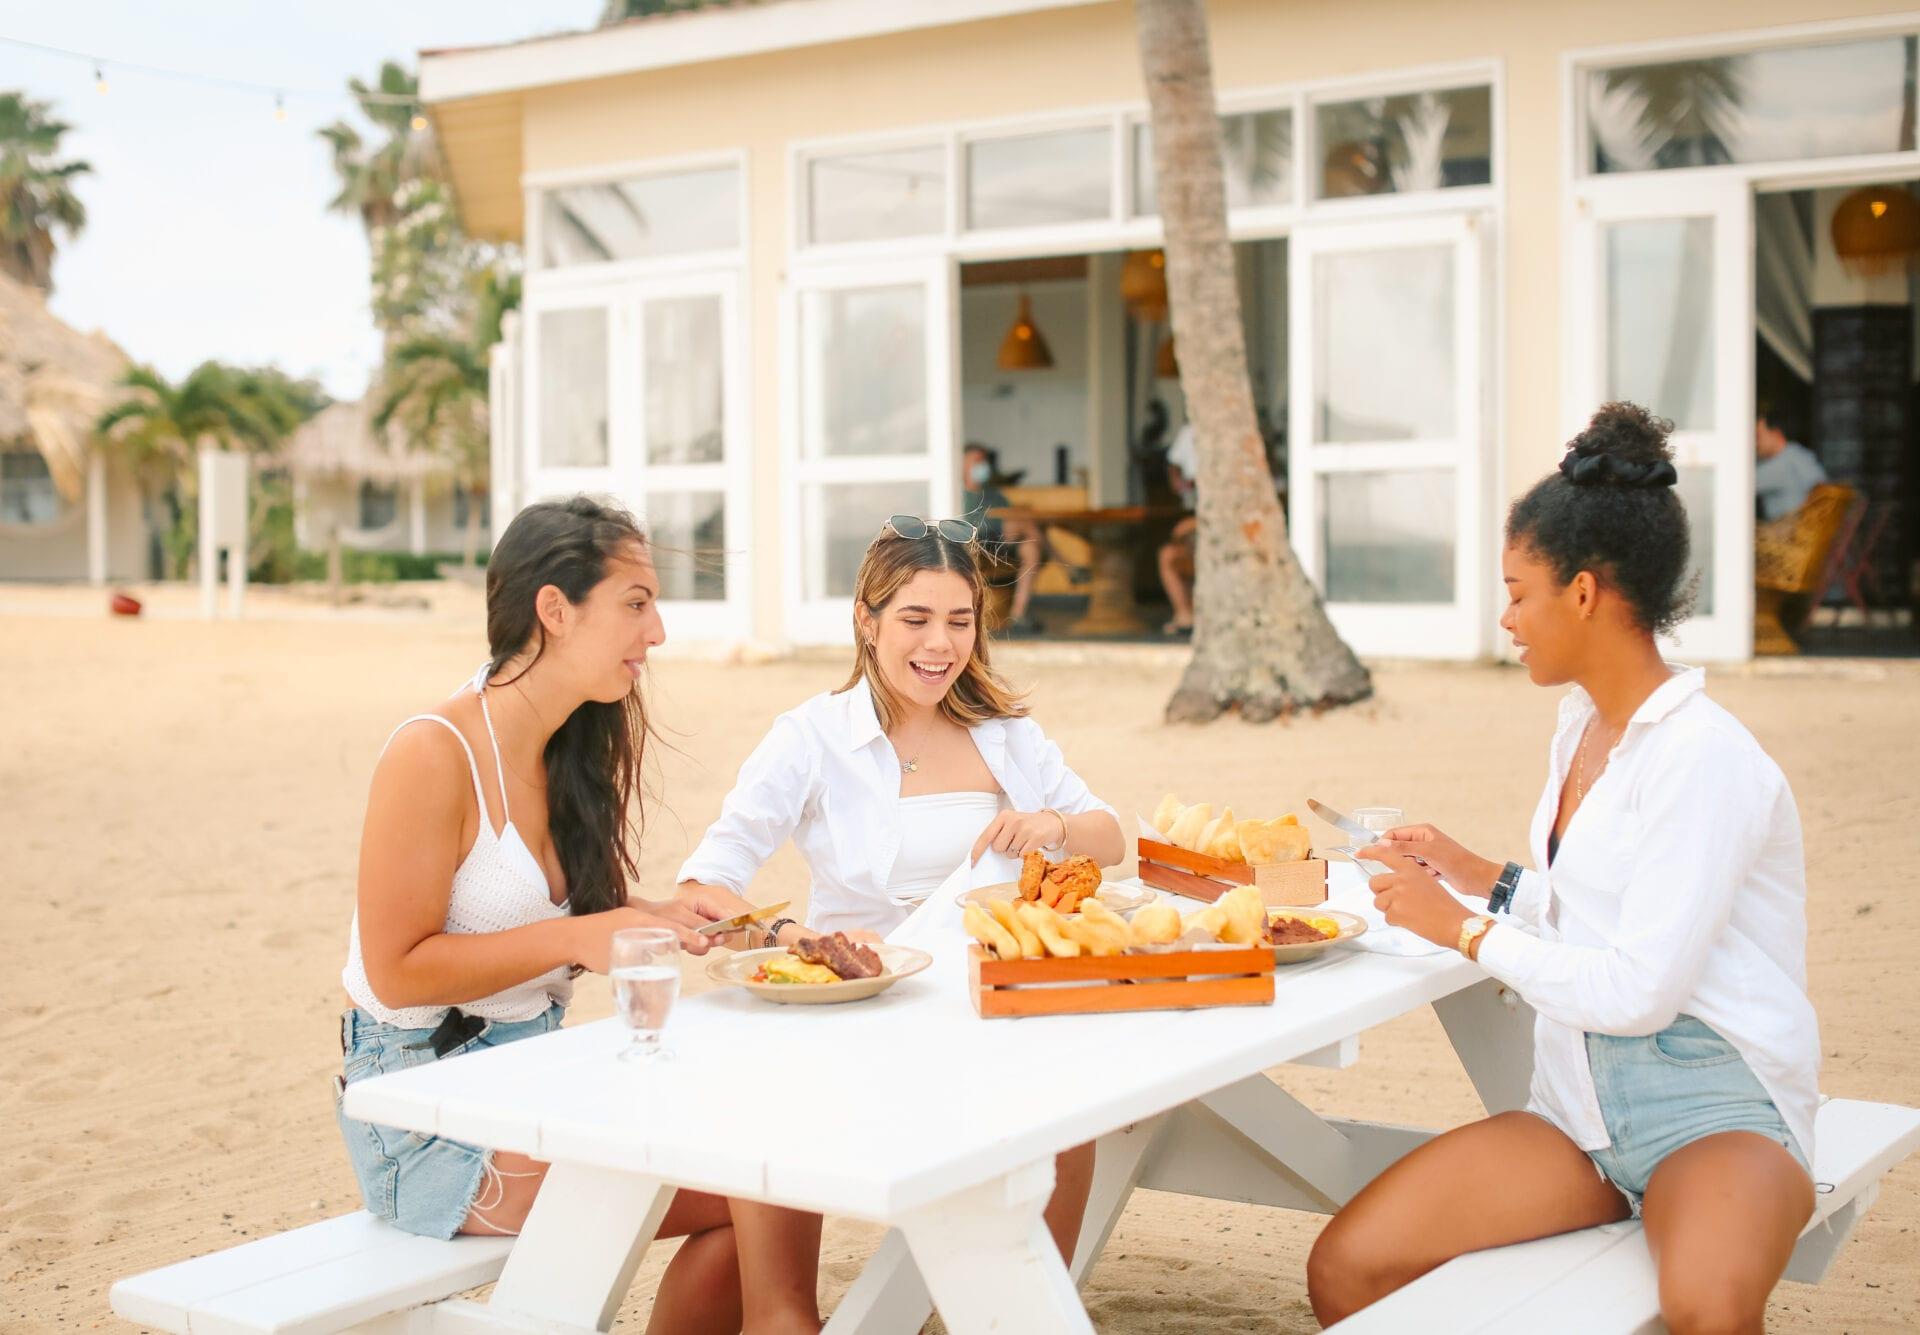 jaguar-reef-lodge-monica-gallardo-photography-breakfast-beach-hopkins